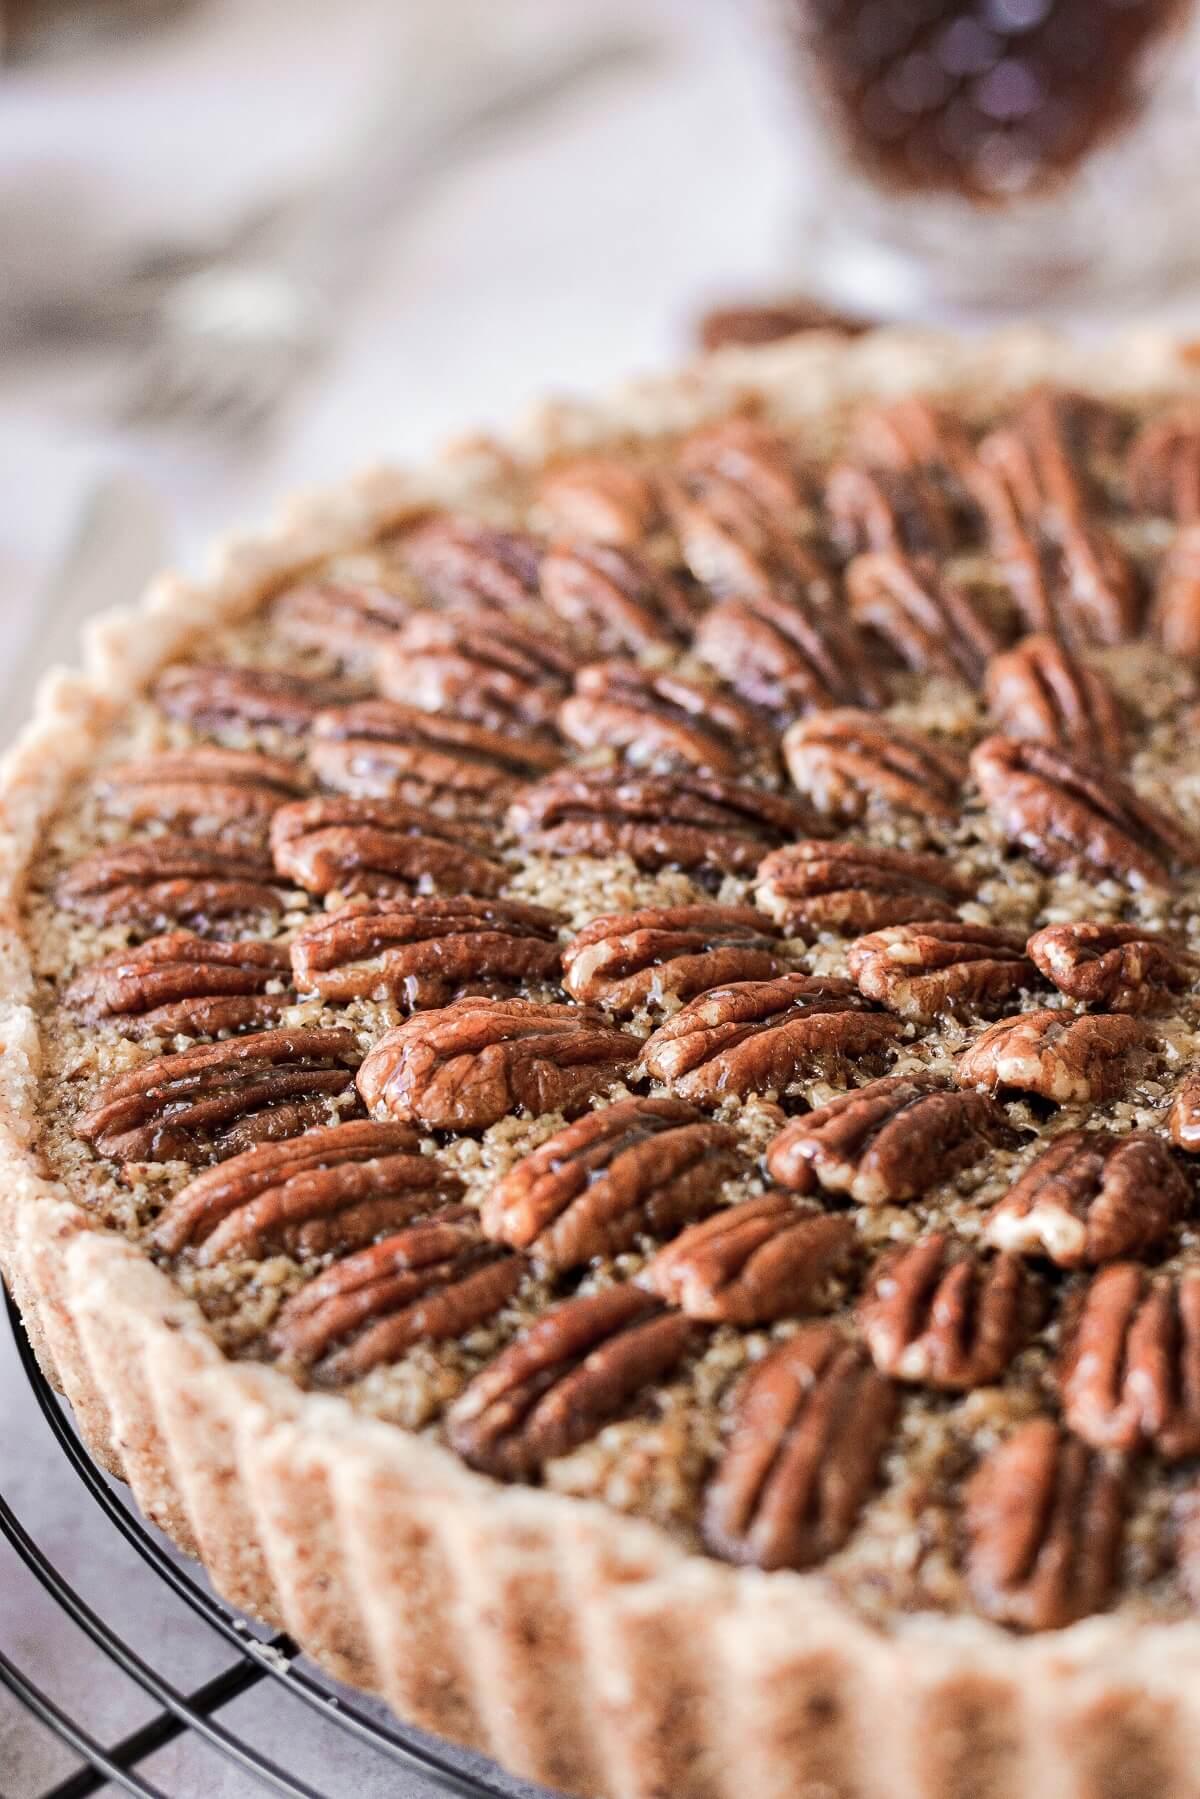 Closeup of pecans on top of a maple pecan tart.